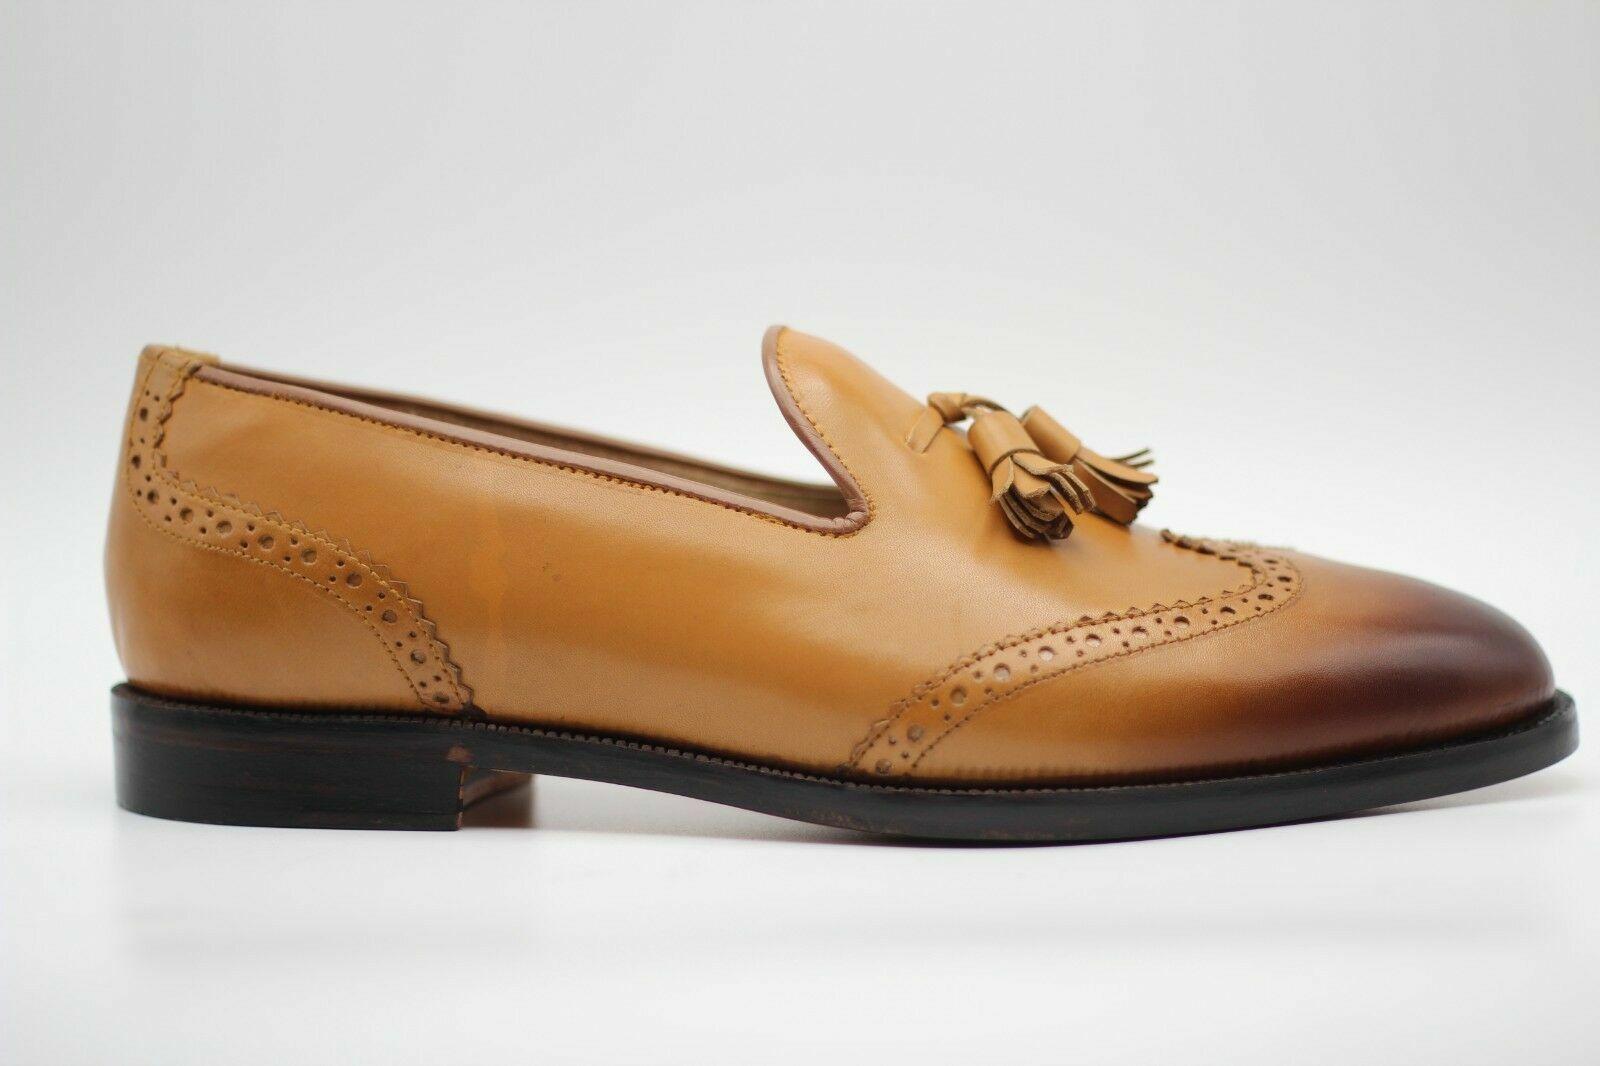 Handgemachte echte Tan Leder Oxford Brogue Wingtip Quasten Mokassin Schuhe